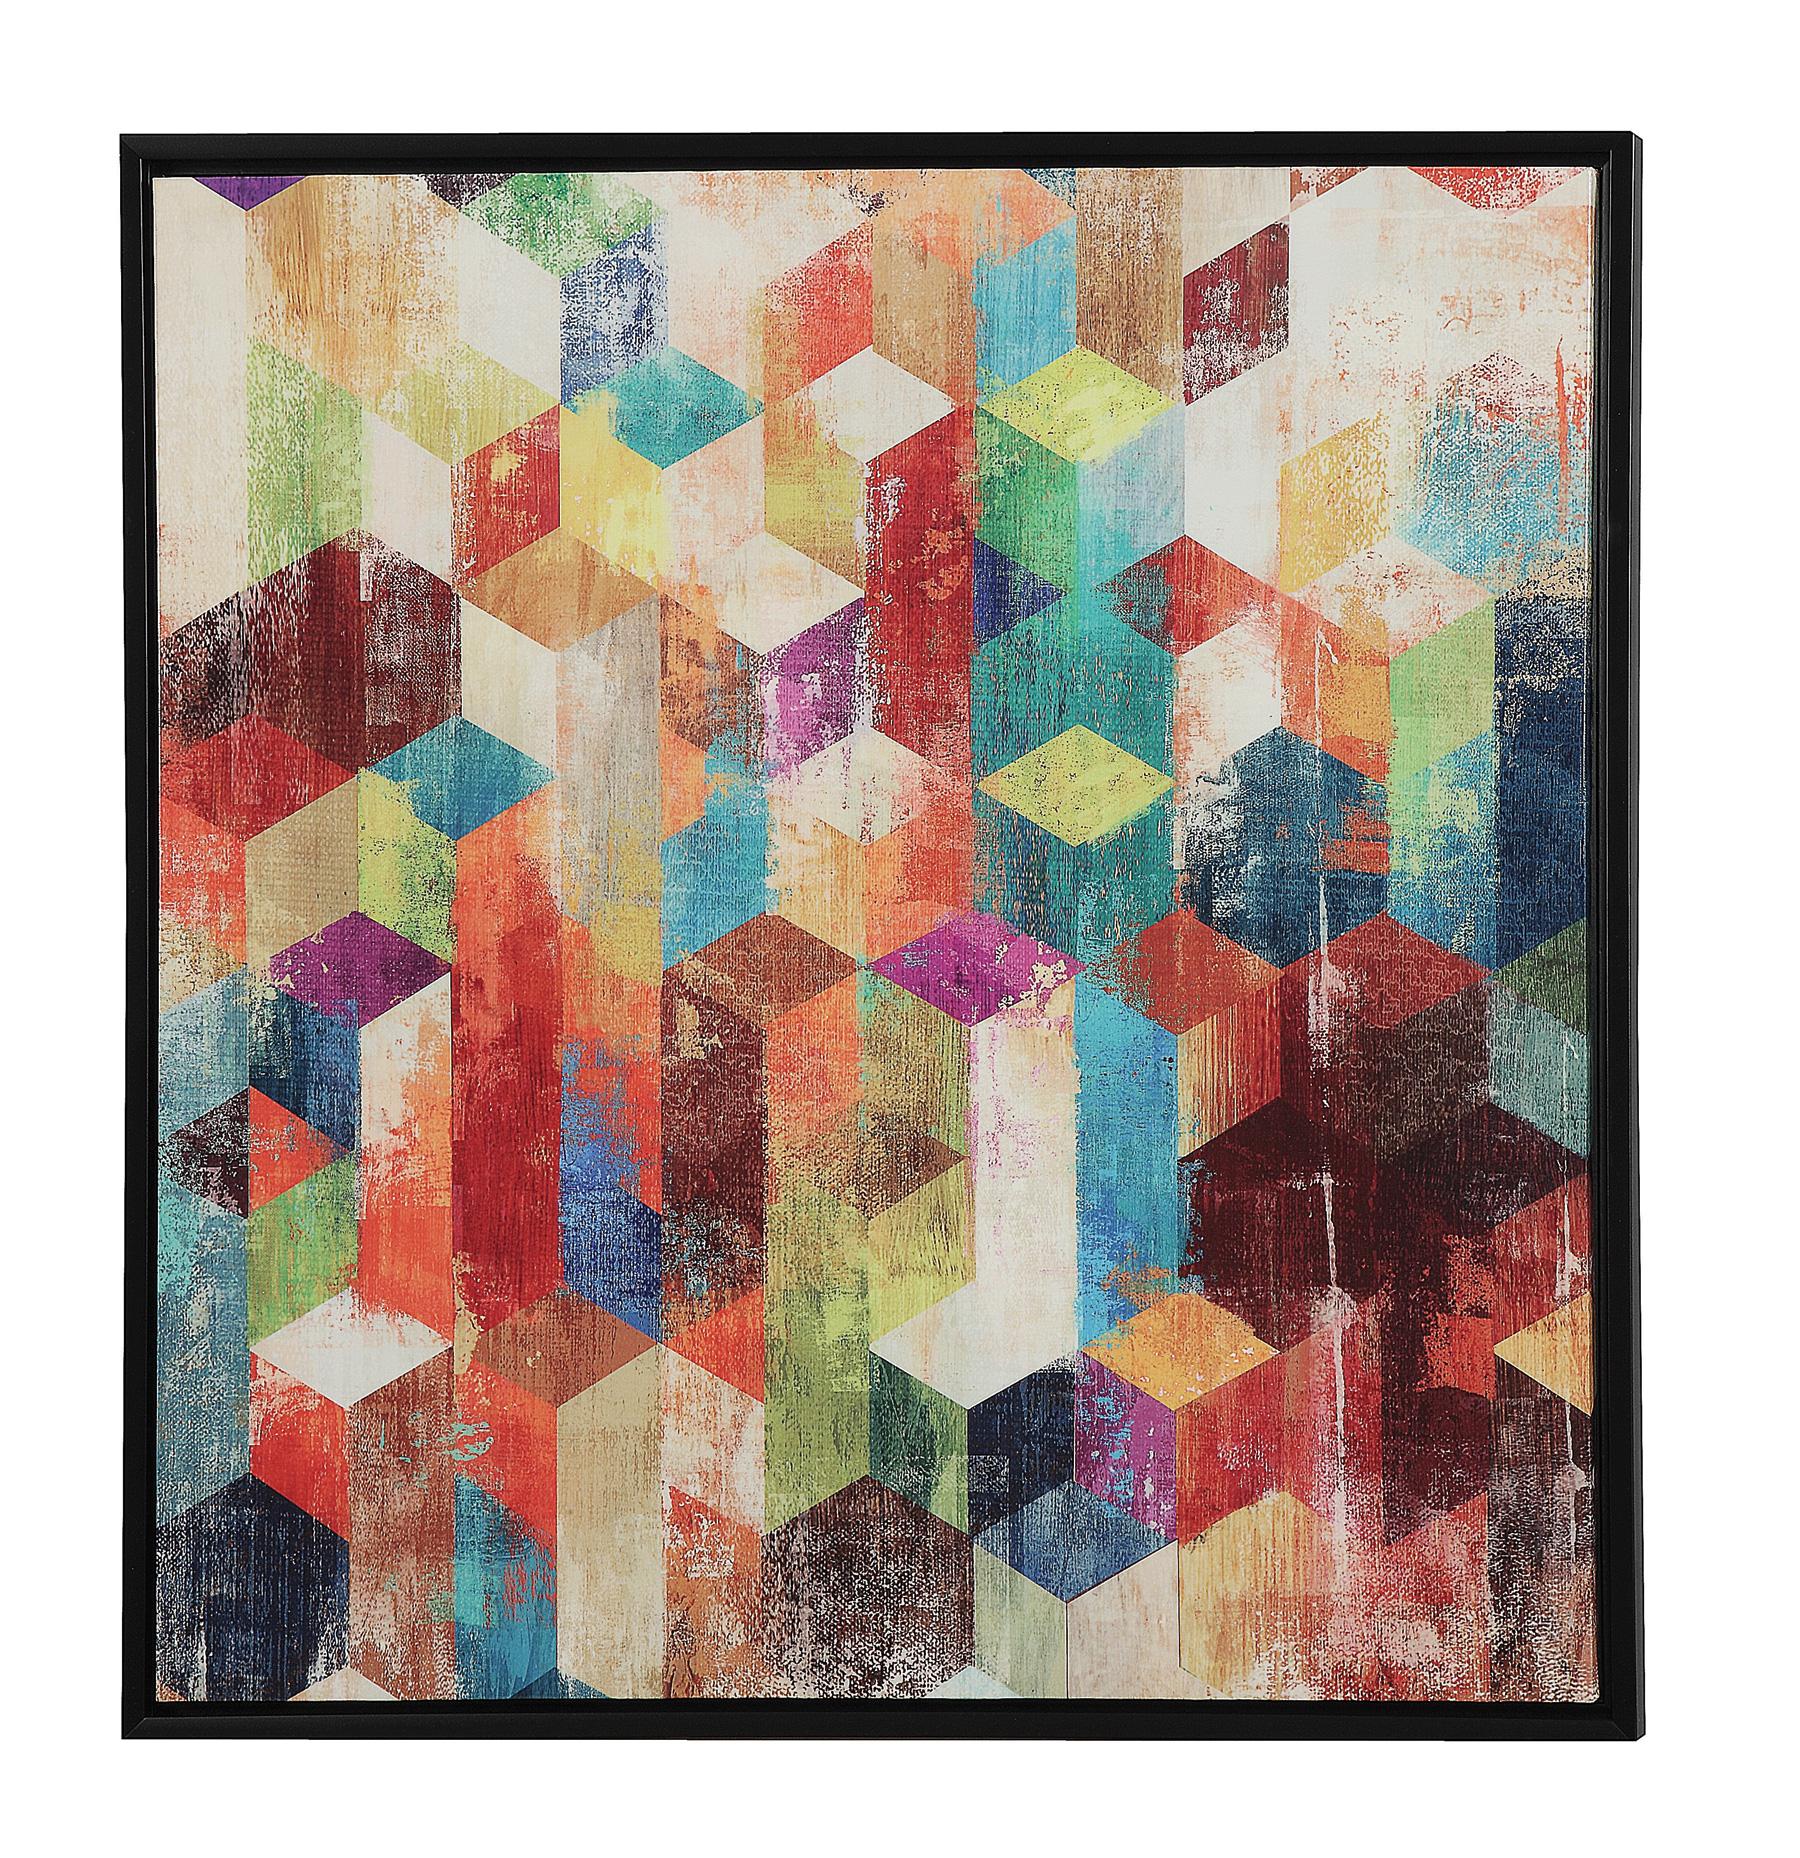 Coaster Wall Art Art - Item Number: 960739